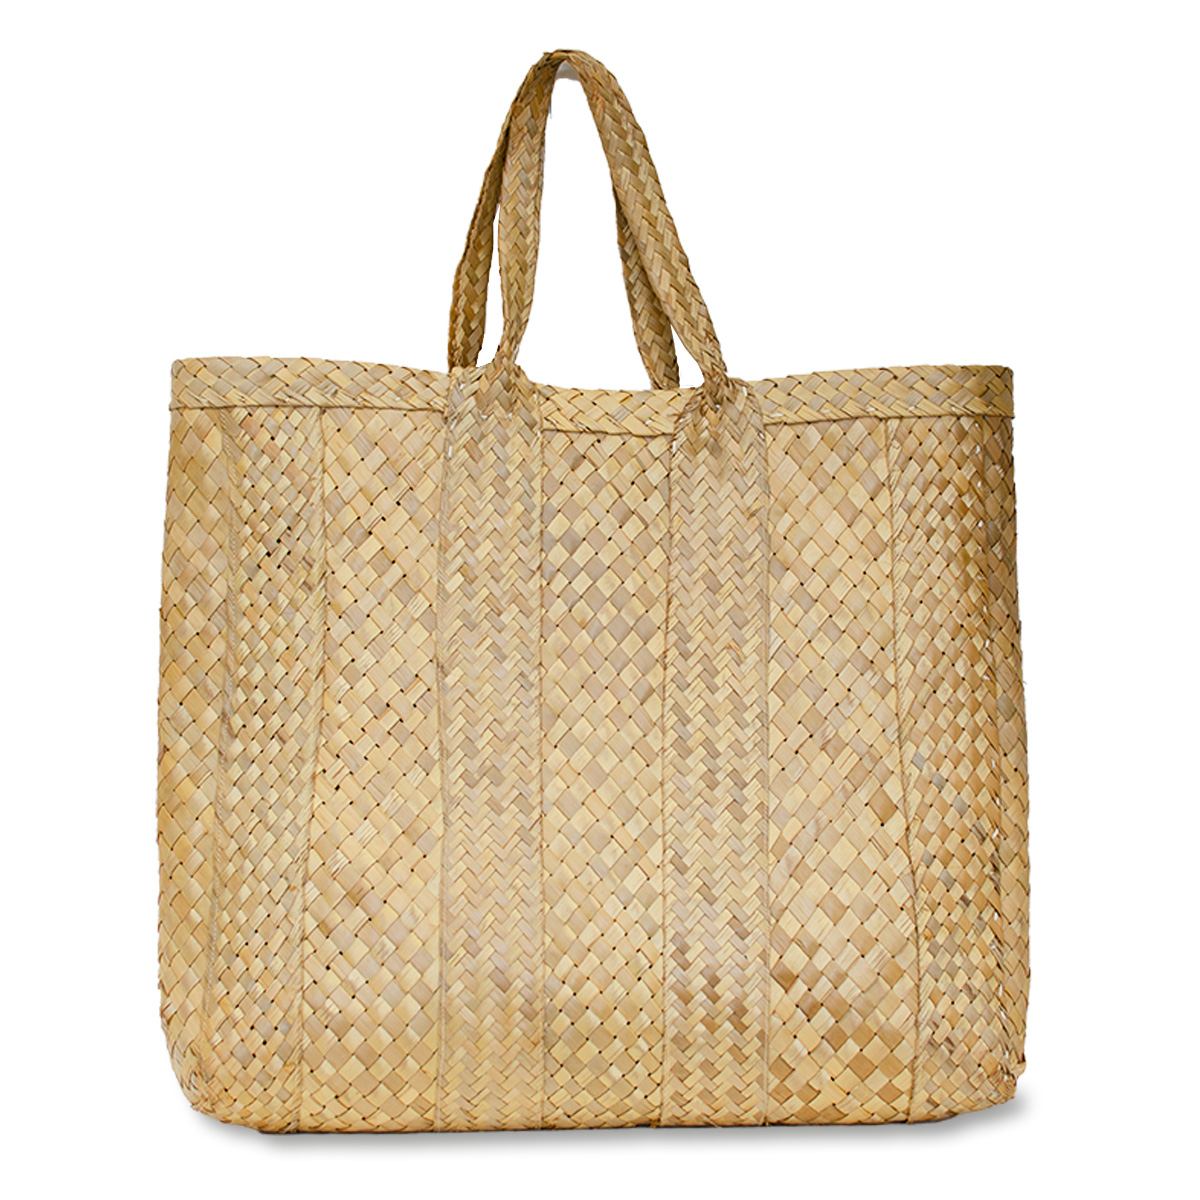 Vintage large straw tote bag